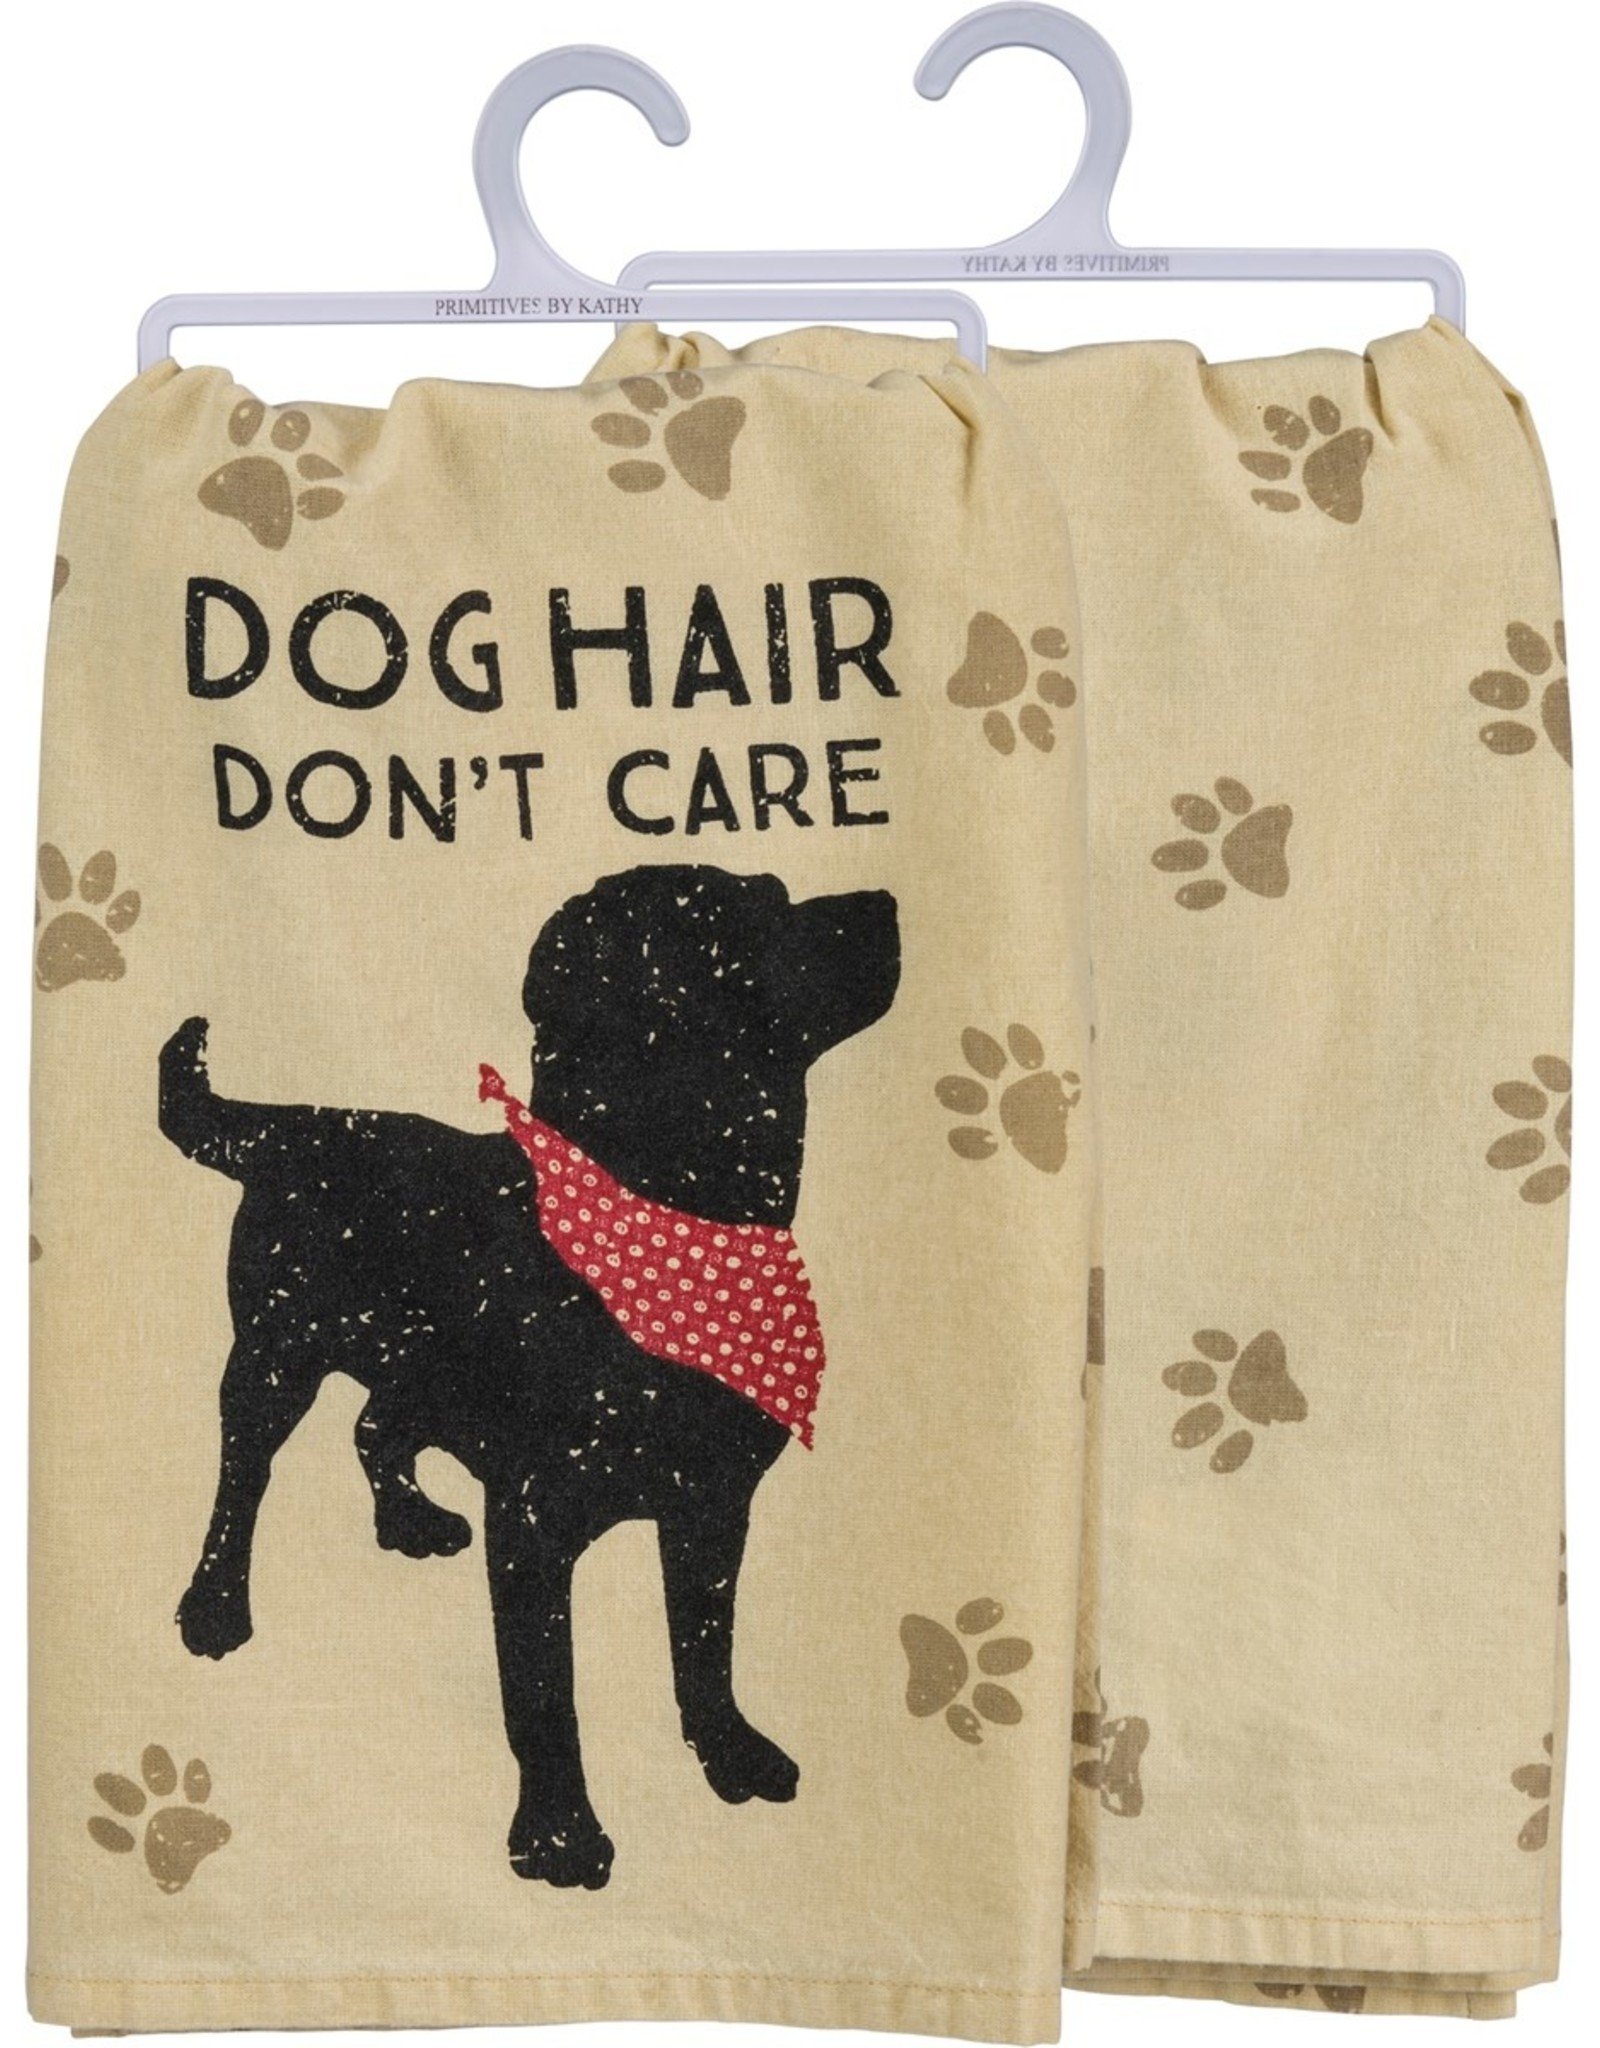 PRIMITIVES BY KATHY DISH TOWEL - DOG HAIR